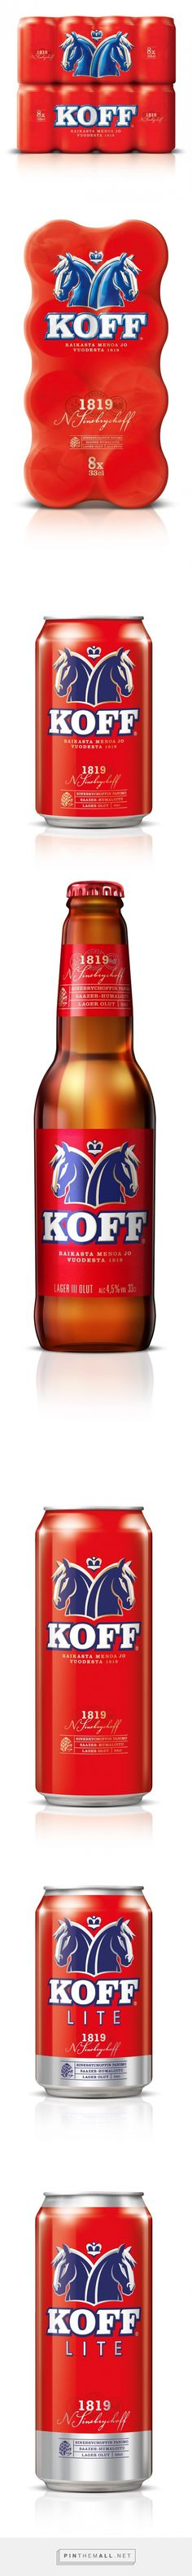 Koff Beer Packaging designed by Taxi Studio (UK) - http://www.packagingoftheworld.com/2016/01/koff.html